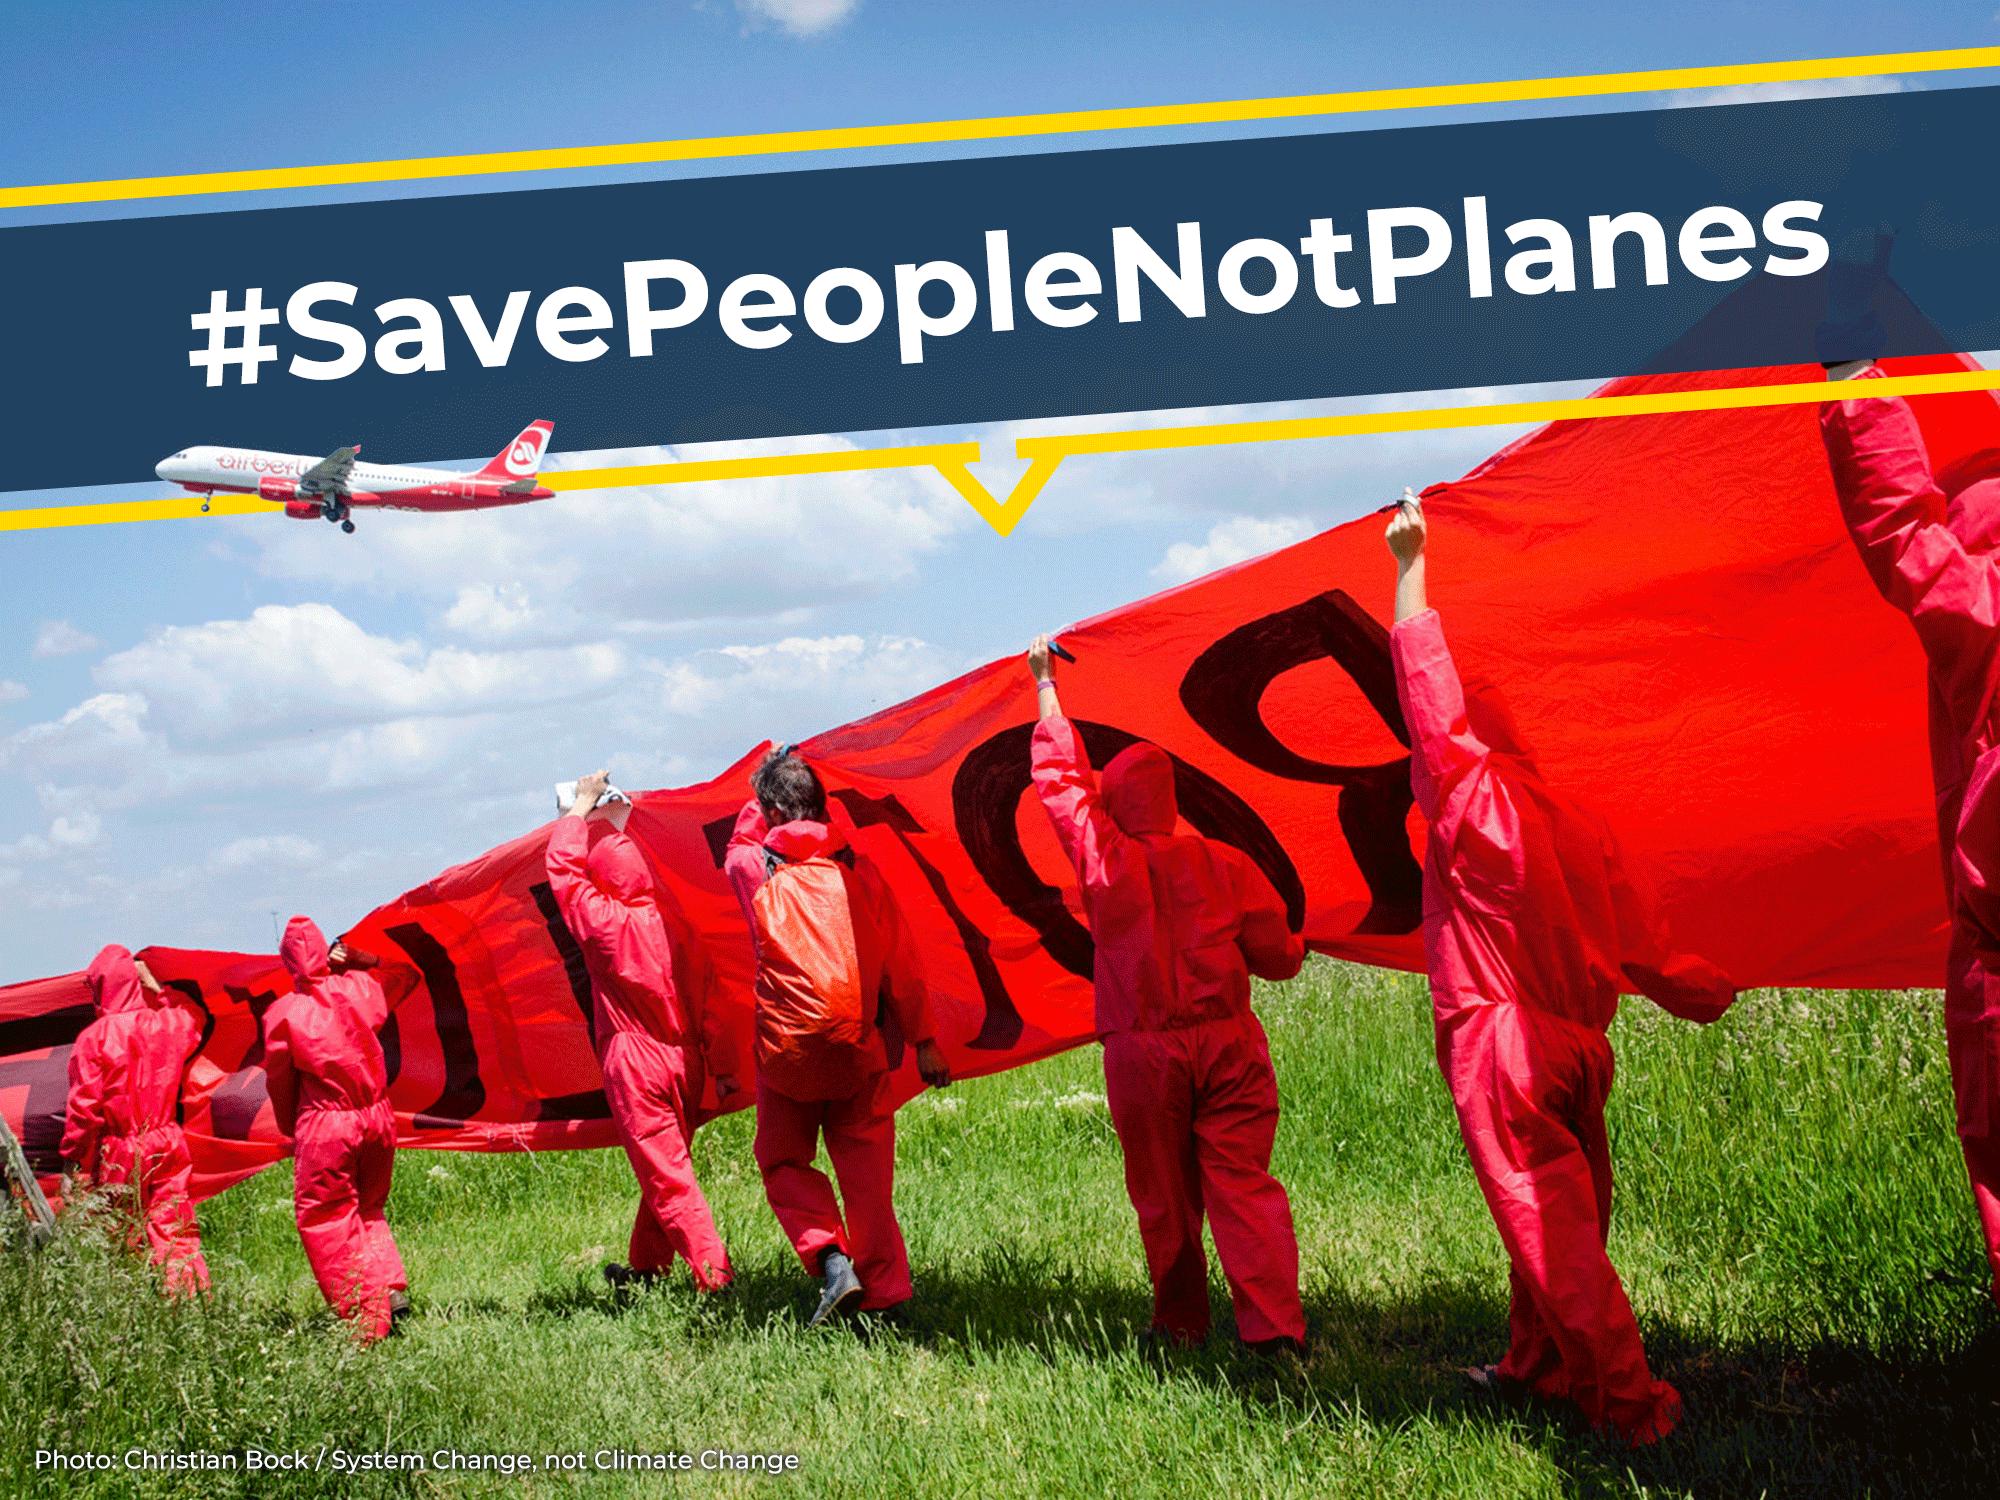 #SavePeopleNotPlanes: Keine Milliardengeschenke an die Flugindustrie